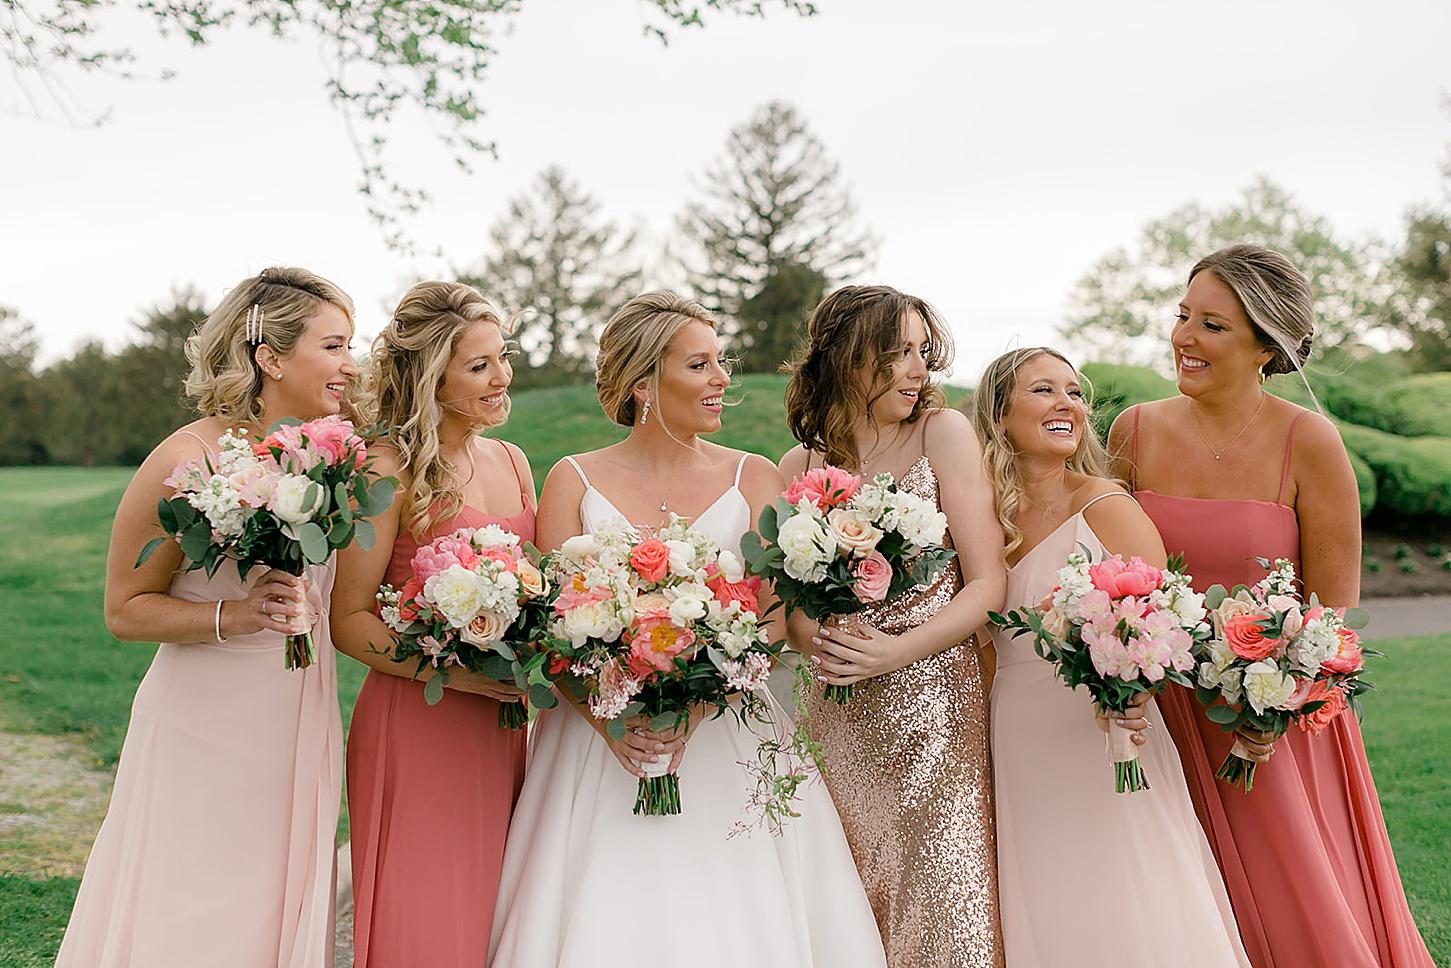 Linwood Country Club Summer Wedding Photography Studio by Magdalena Studios Jenn Kyle 0032